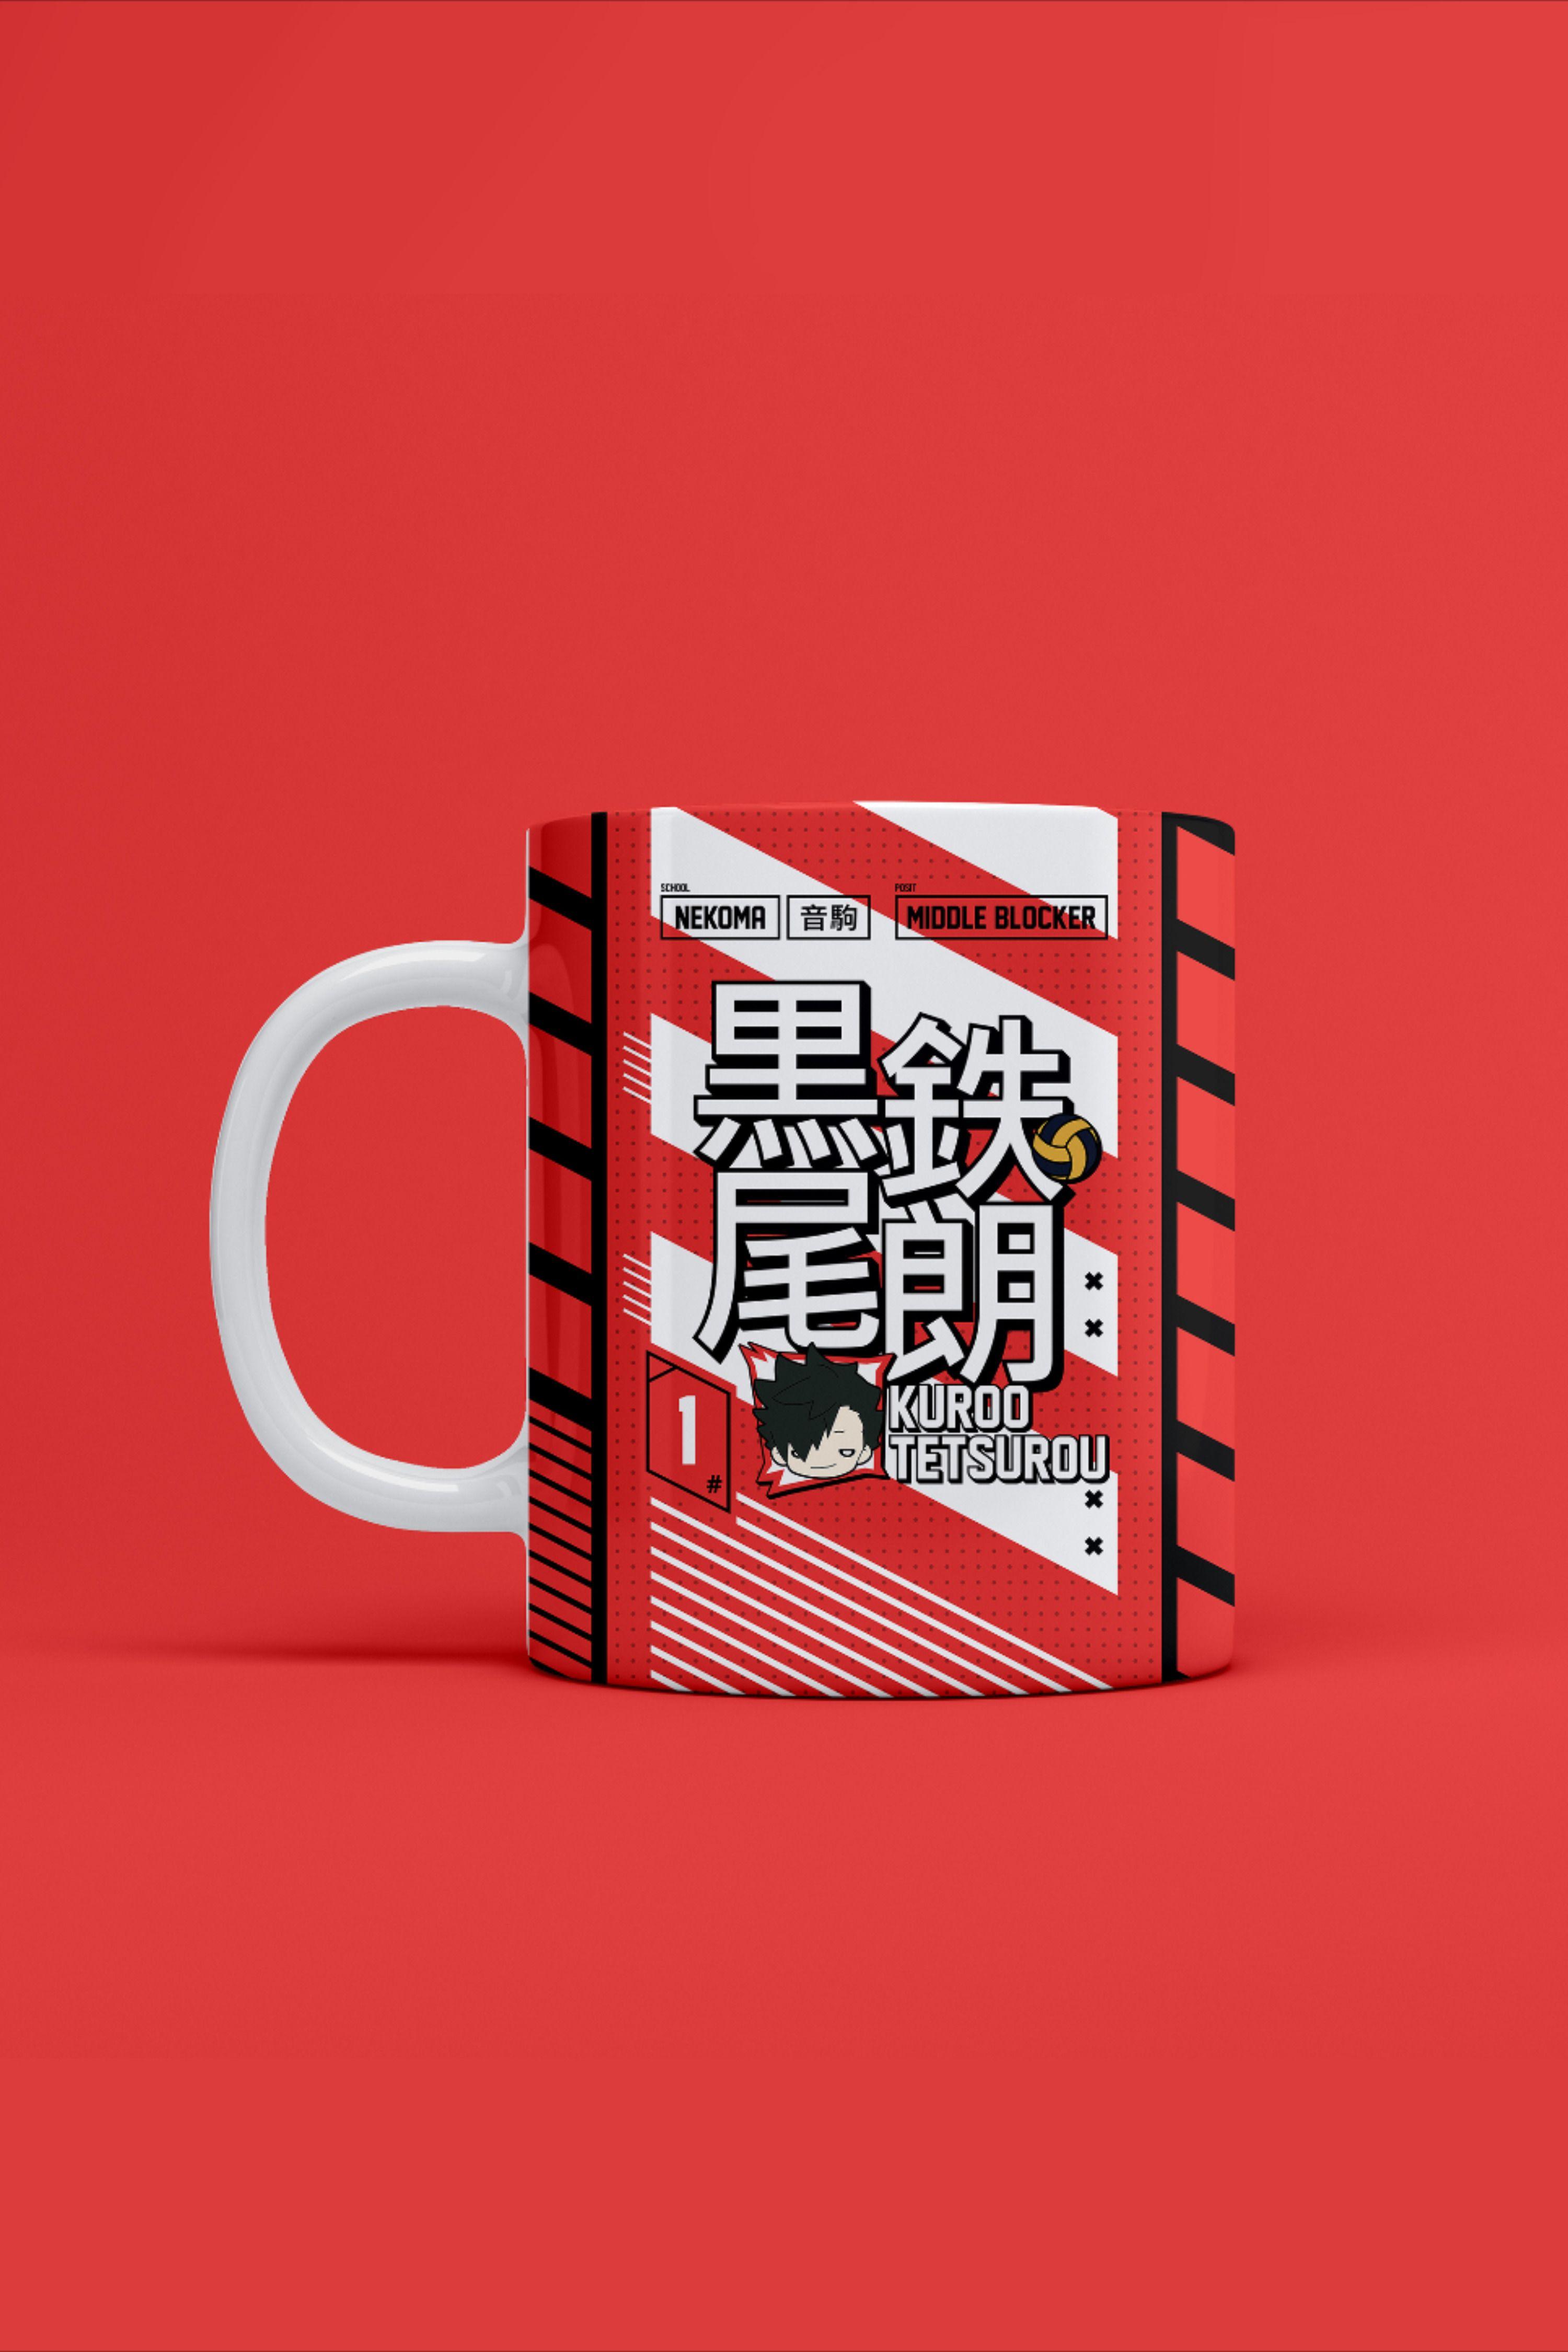 Kuroo Tetsurou Nekoma Haikyuu Mug By Ihasartwork In 2020 Kuroo Tetsurou Haikyuu Kuroo